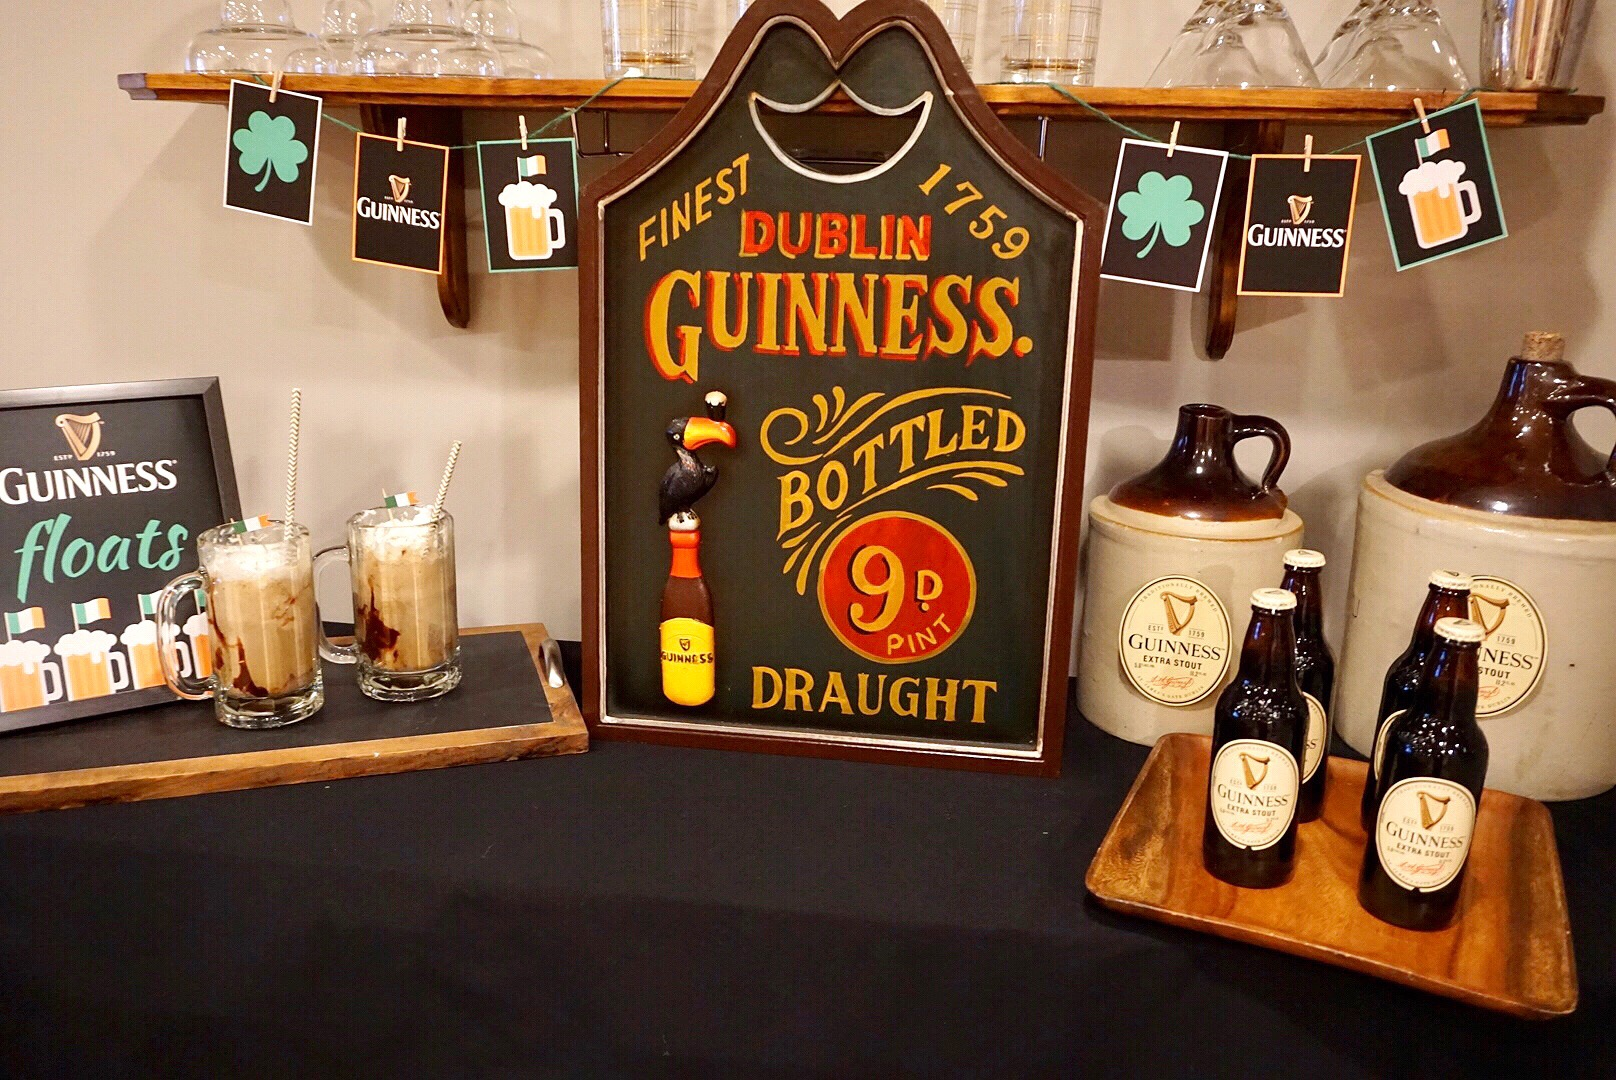 Guinness themed bar for St. Patrick's Day.